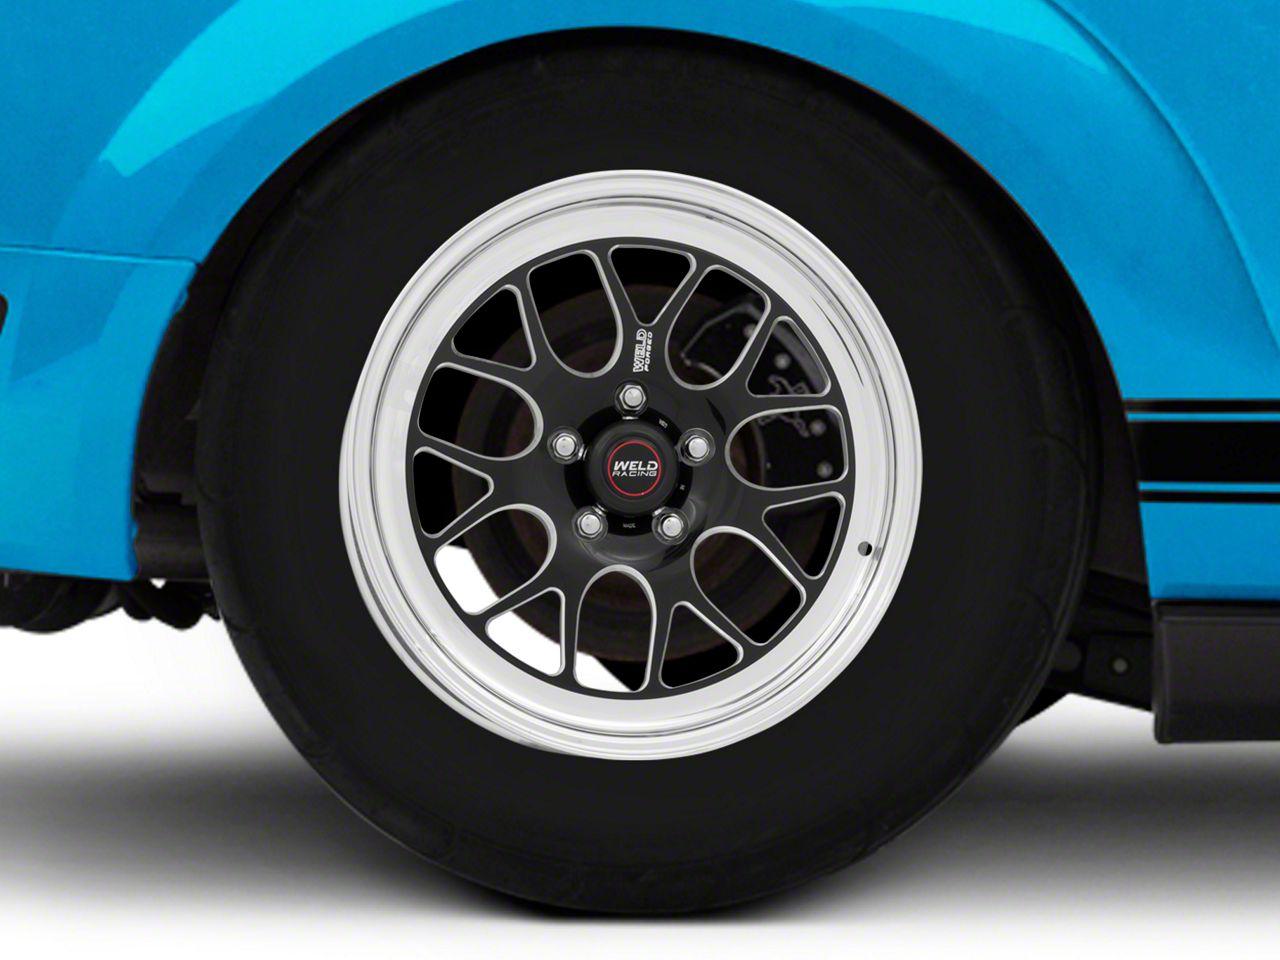 weld racing mustang rts s77 black anodized wheel 17x10 05 Mustang GT Grill weld racing rts s77 black anodized wheel 17x10 05 14 standard gt v6